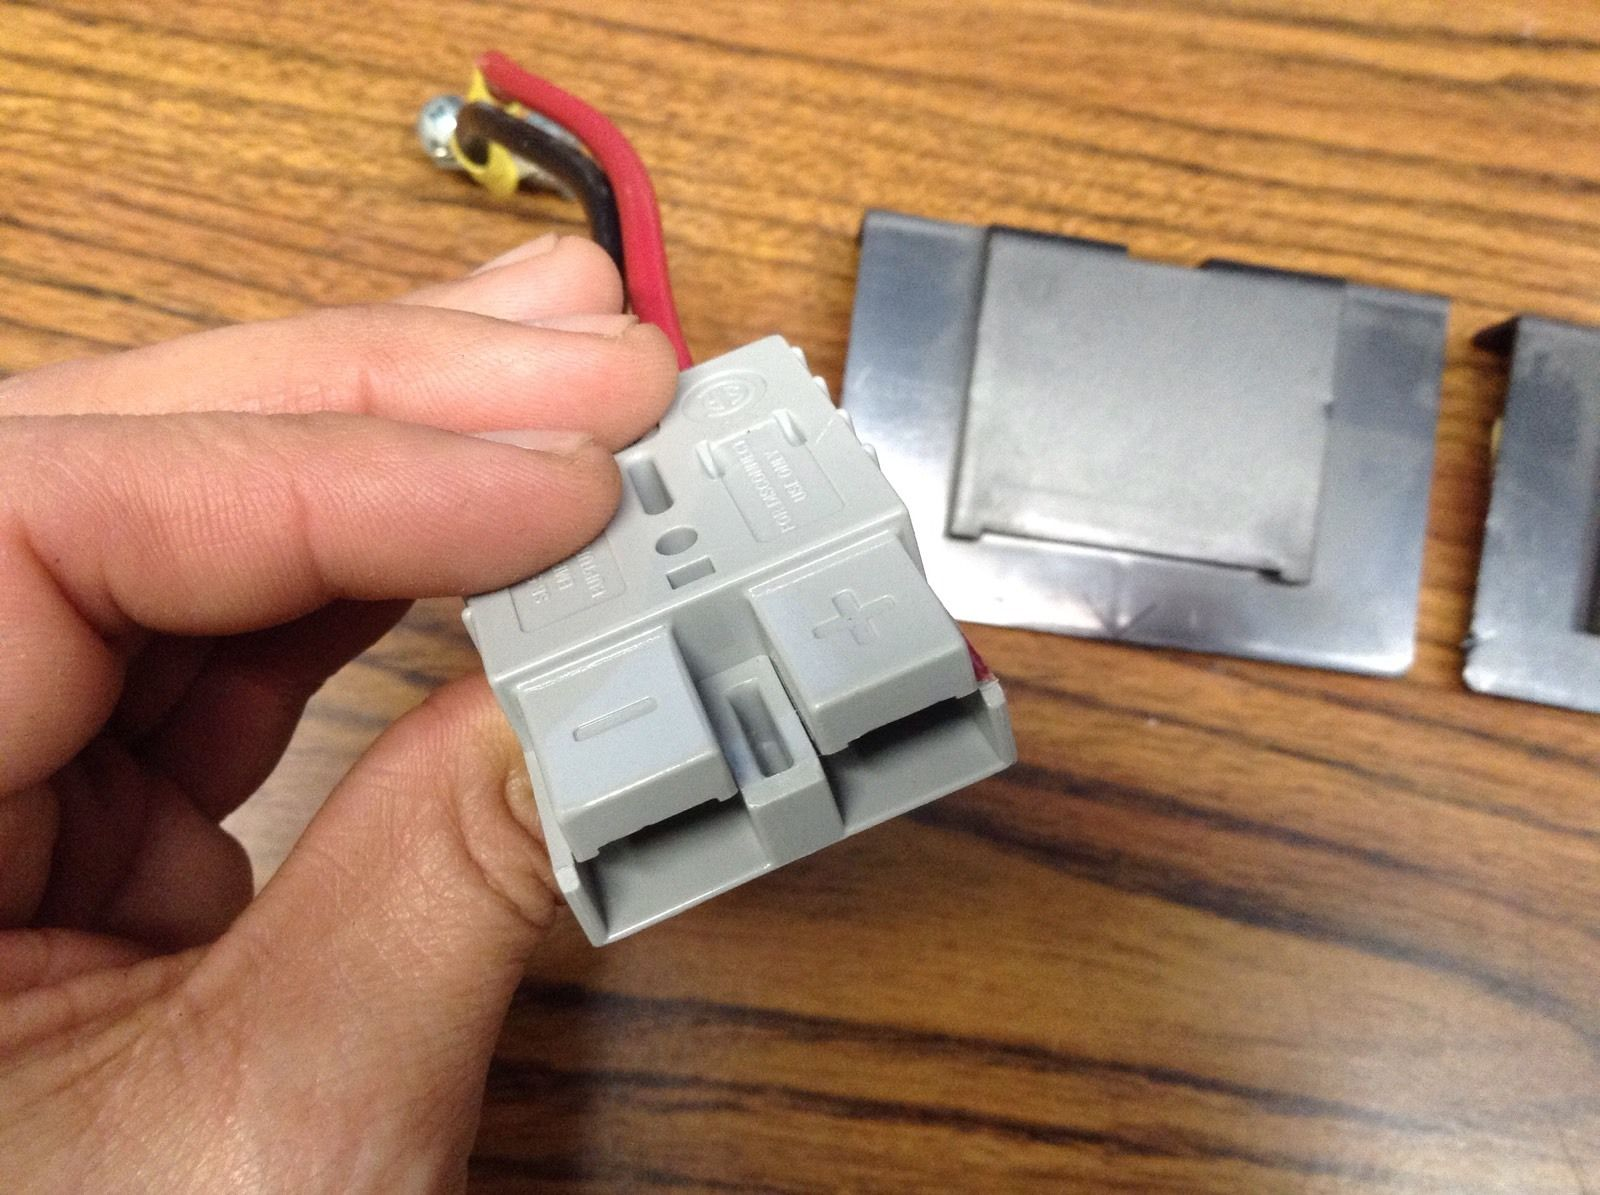 Apc Wiring Harness Diagram Battery Connector Fuse Rbc7 Rbc11 Smart Ups C3500 Color Tpi